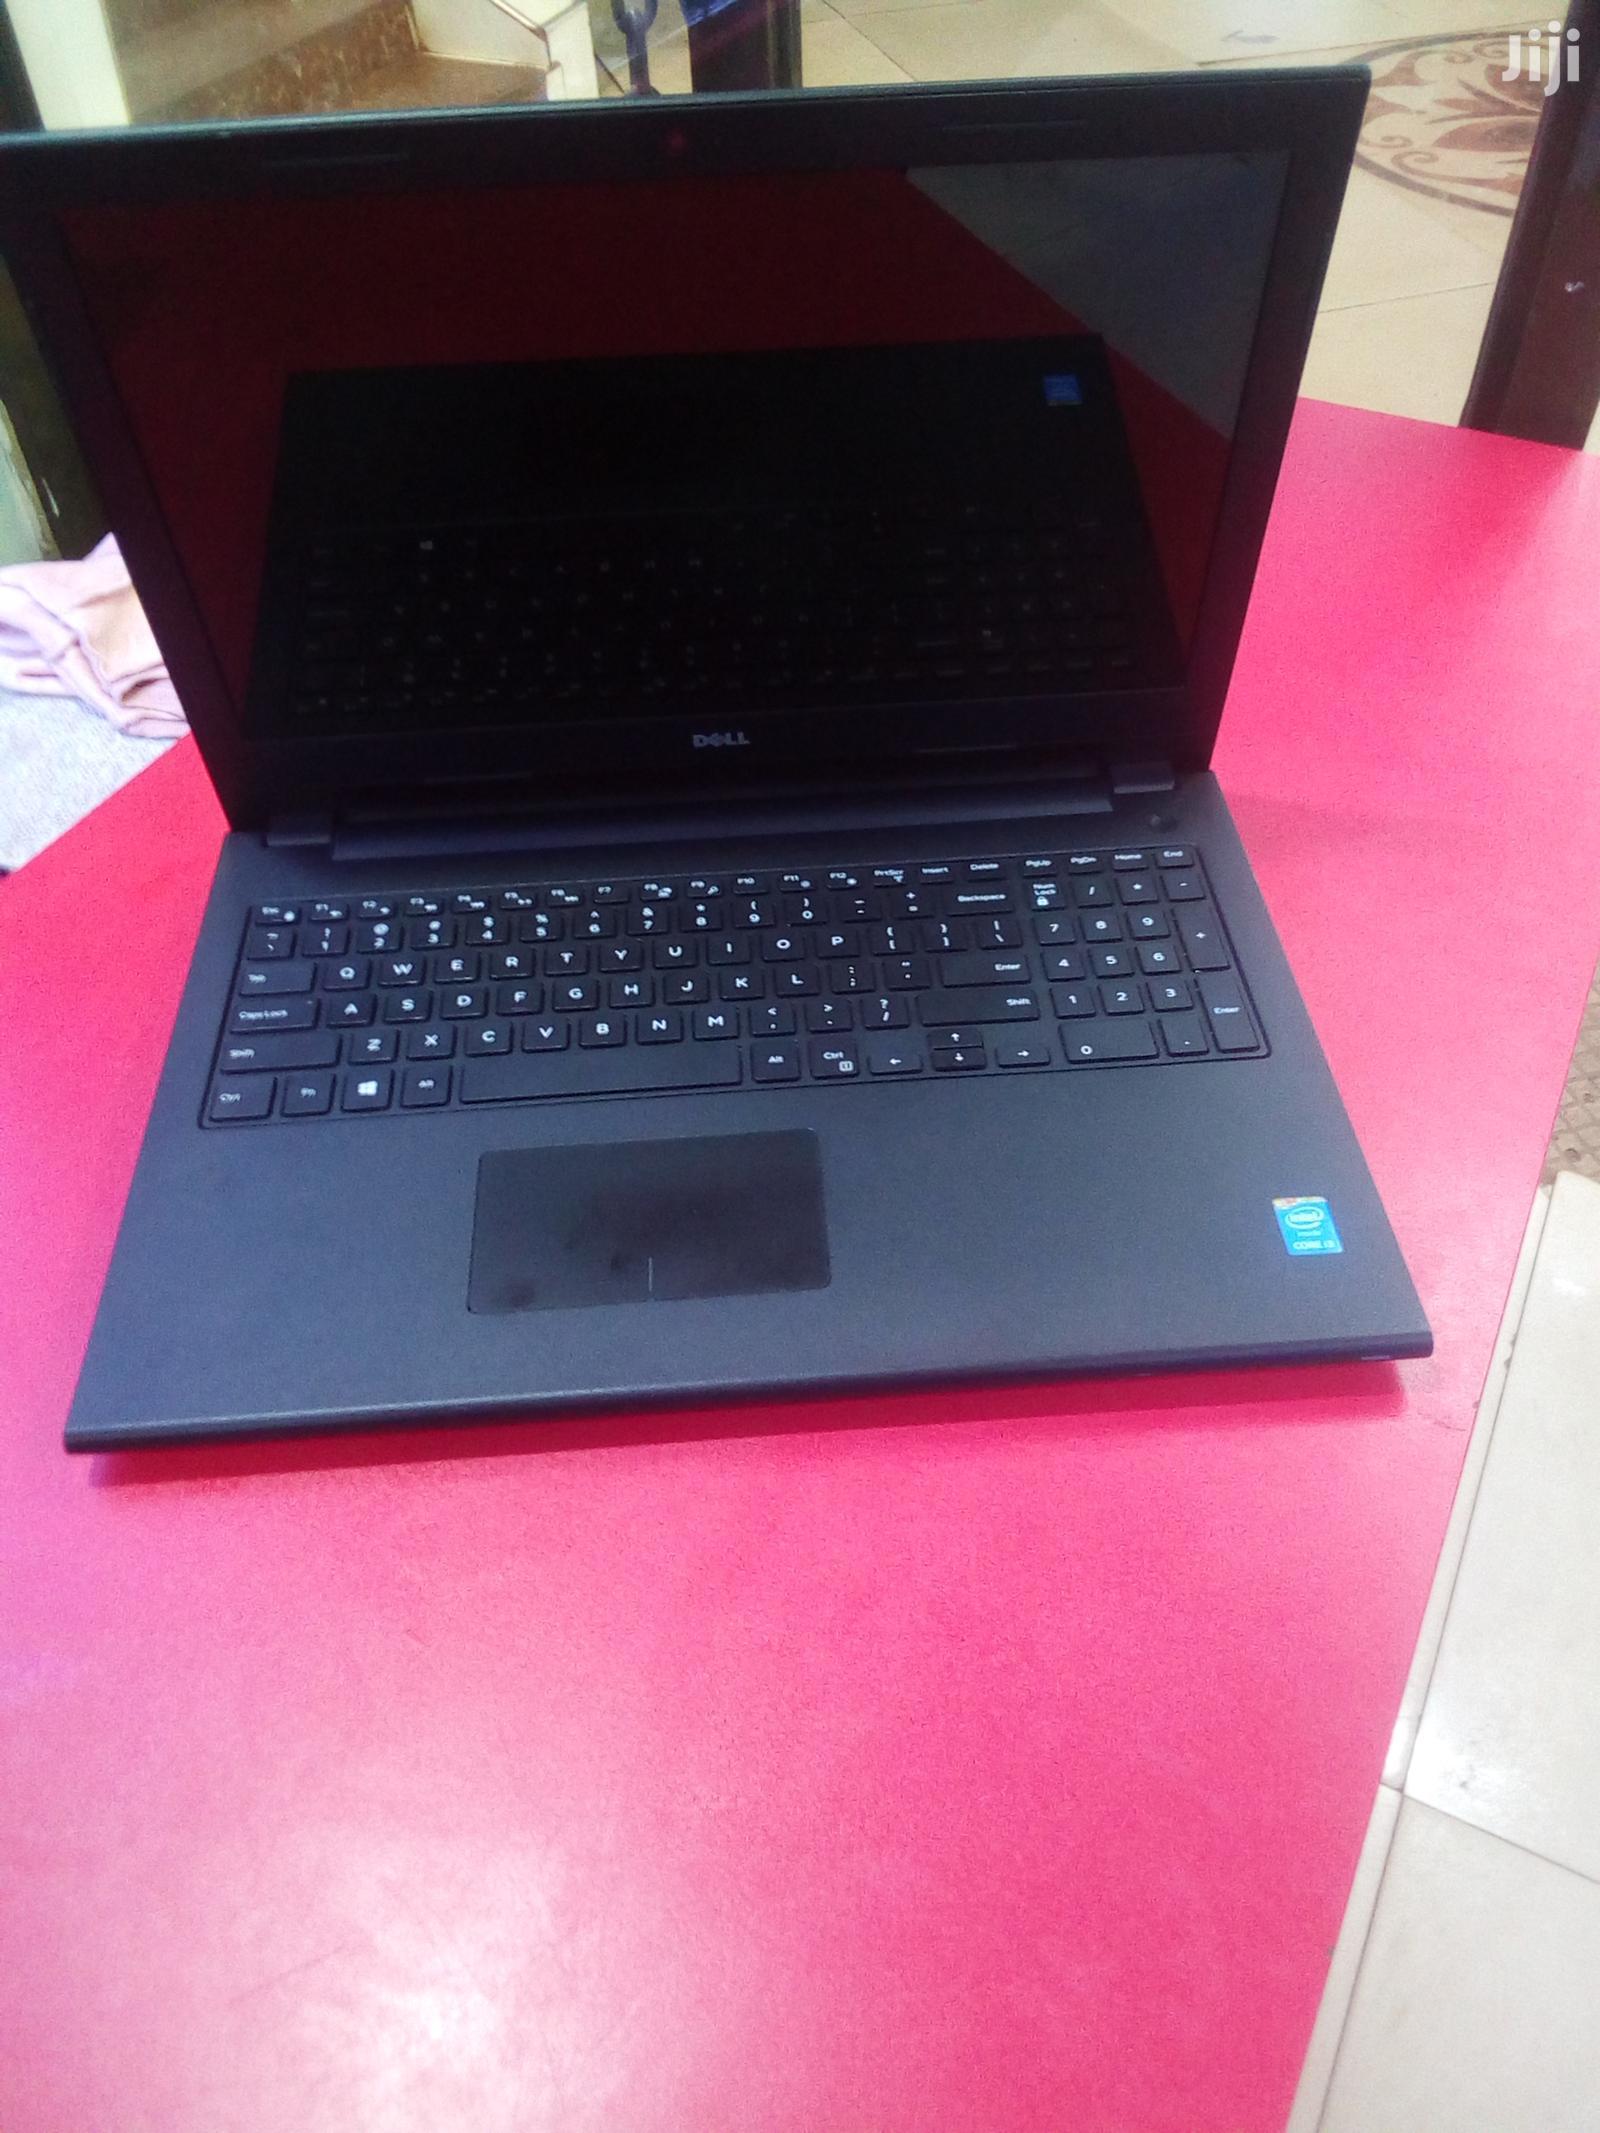 Laptop Dell Inspiron 3542 4GB Intel Core I5 HDD 500GB